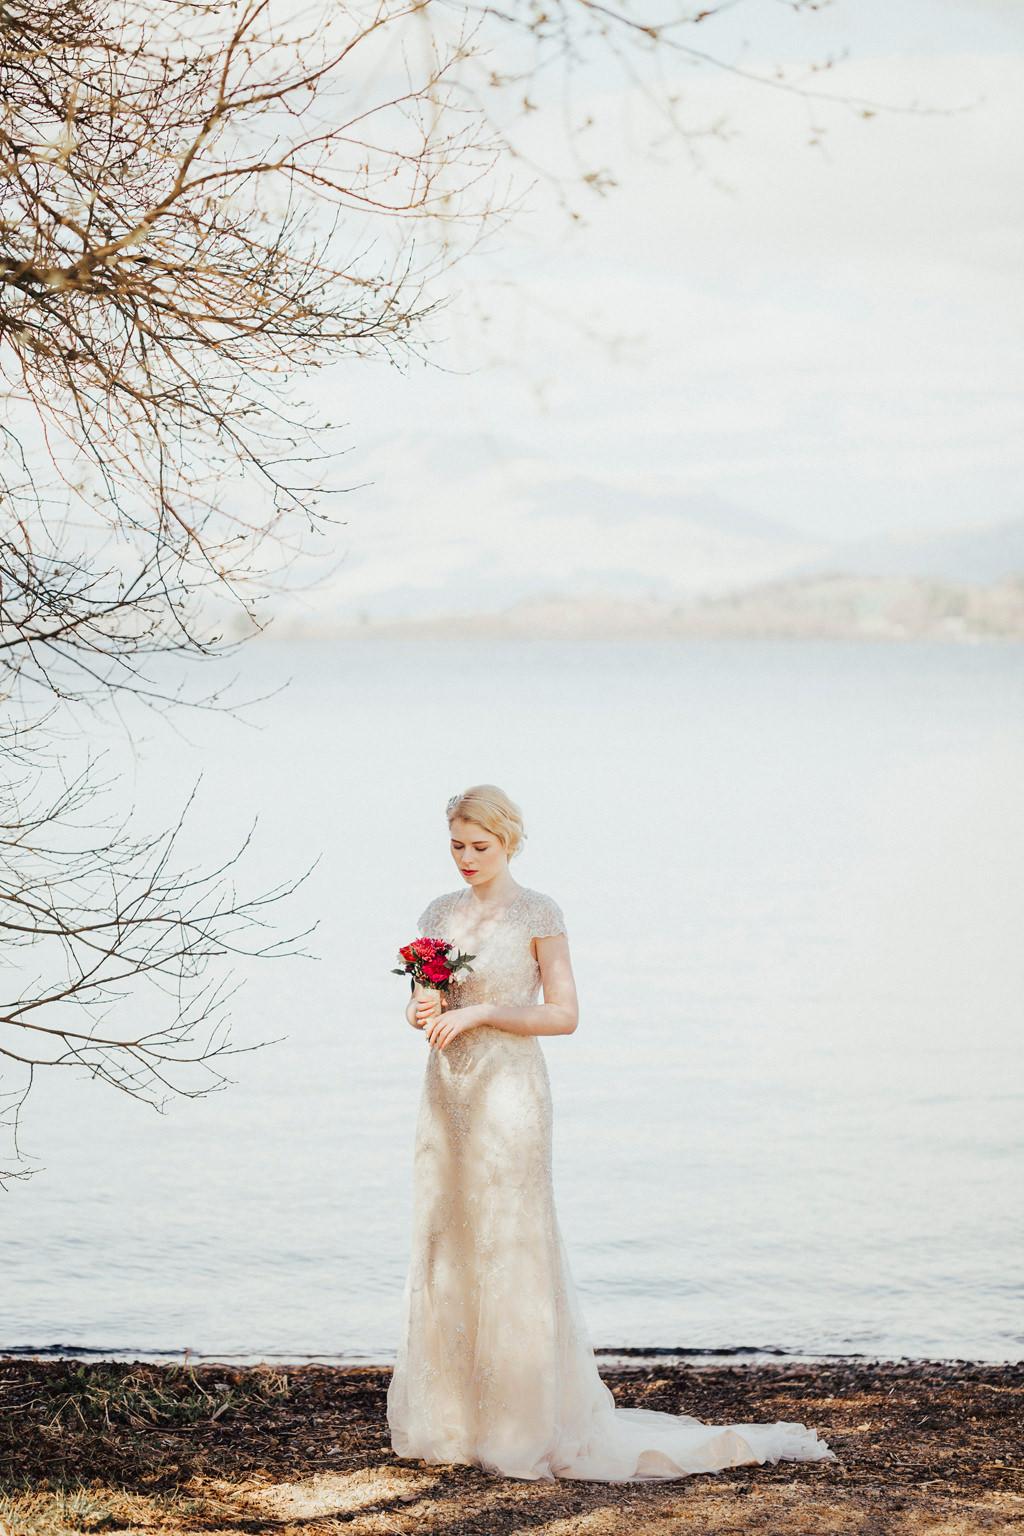 001-scotland-wedding-photographer.jpg